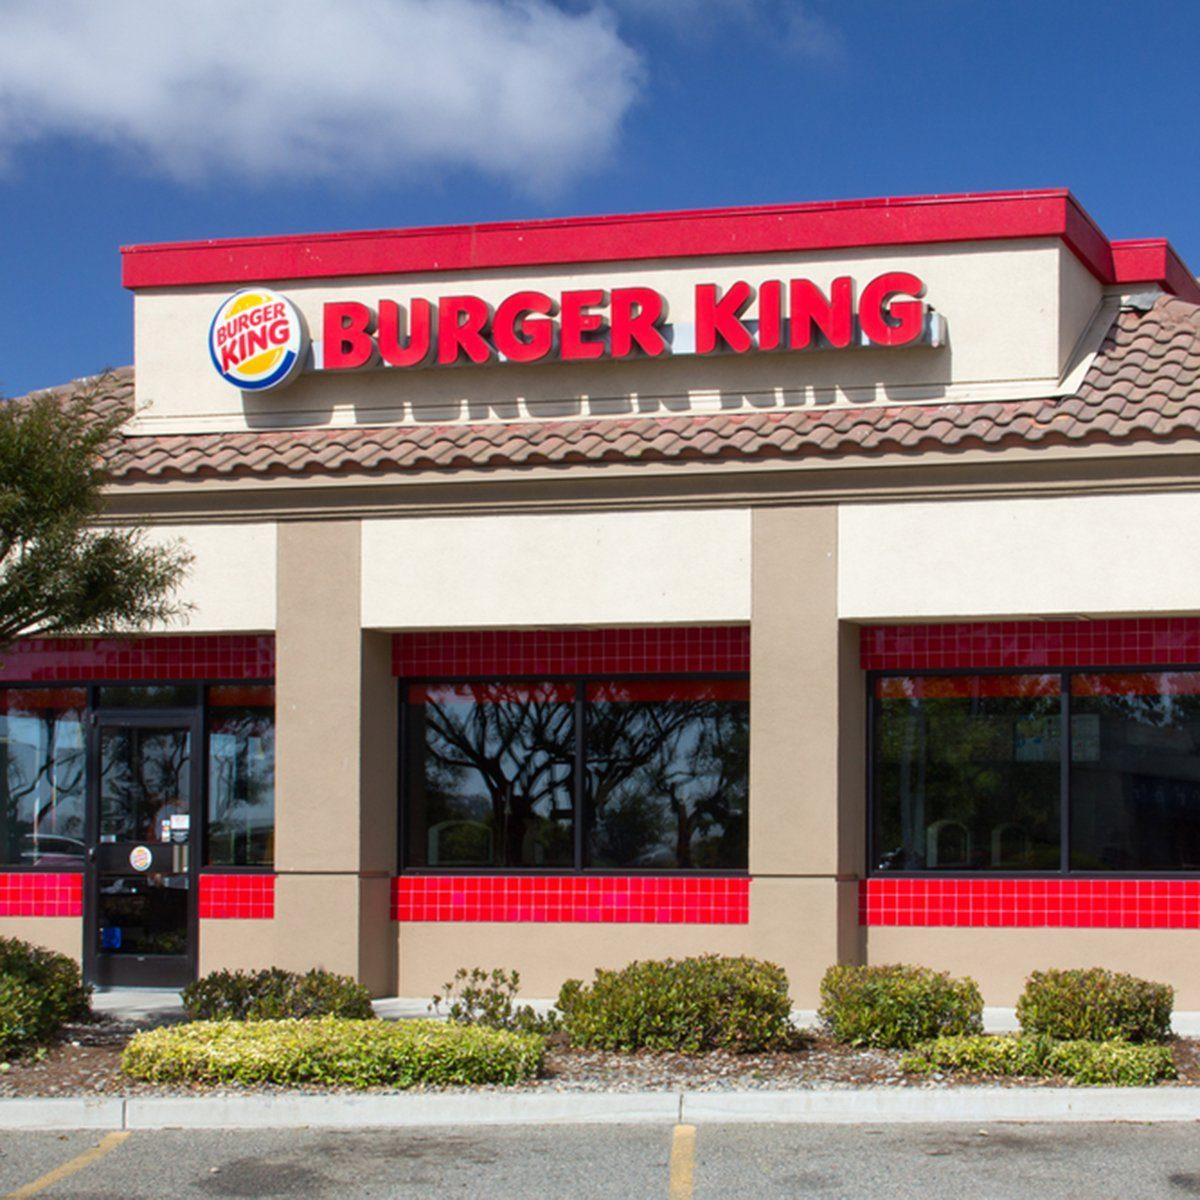 Burger King restaurant exterior.